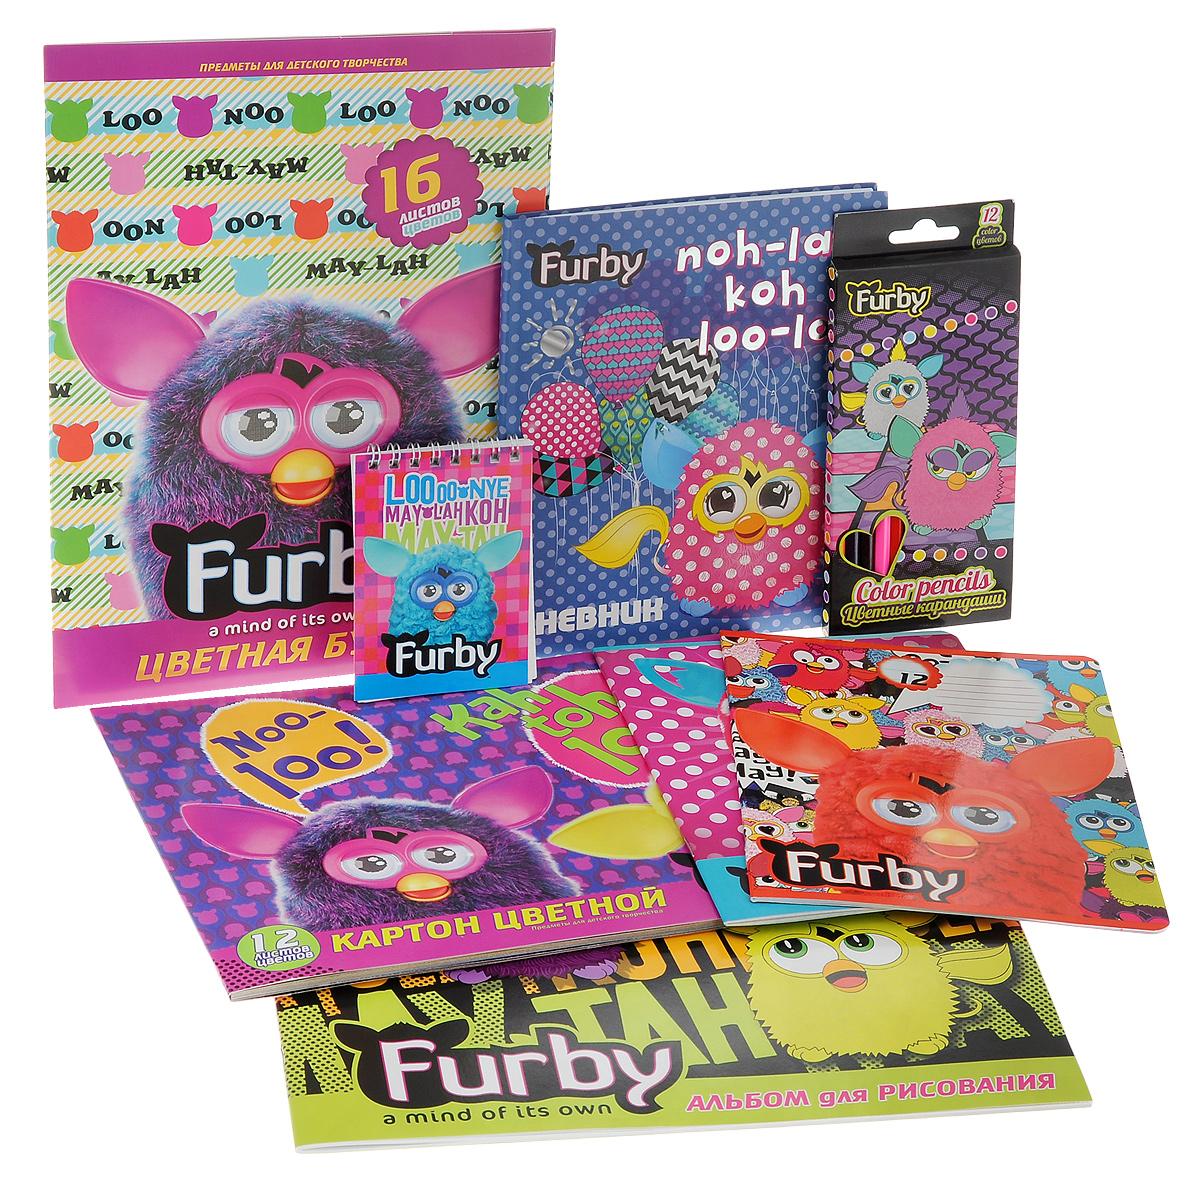 ����� �������� ��������������� Furby, 44 �������� - Furby (�����)FROZ-UT1-PVC10����� �������� ��������������� Furby �������� ���� ����������� ������������ Furby ������ ���� ��������������� � ������! ����� ����� �������� ���������������, �� ������� ���������� ����� ����������� �����������, ����������� ���������� ������ �������. ����� �������� � ����: ��������� ������� (12 ����), ������ ��� ��������� 20 ������, ����� ������� ������ ������� �4, 16 ������, ����� �������� ������� ������� �4, 12 ������, �������� ������� 12 ������ (� �������), ������� 40 ������, ������� ��������. ��� �������� ������ ��������� � ���������� �����-�����. ����� ����������� �� ����������� ��������-������ � ����� ����������� ����� ��� ���������. ��������� ������ ������� �������� ������� �� ���� ����������� � �����!